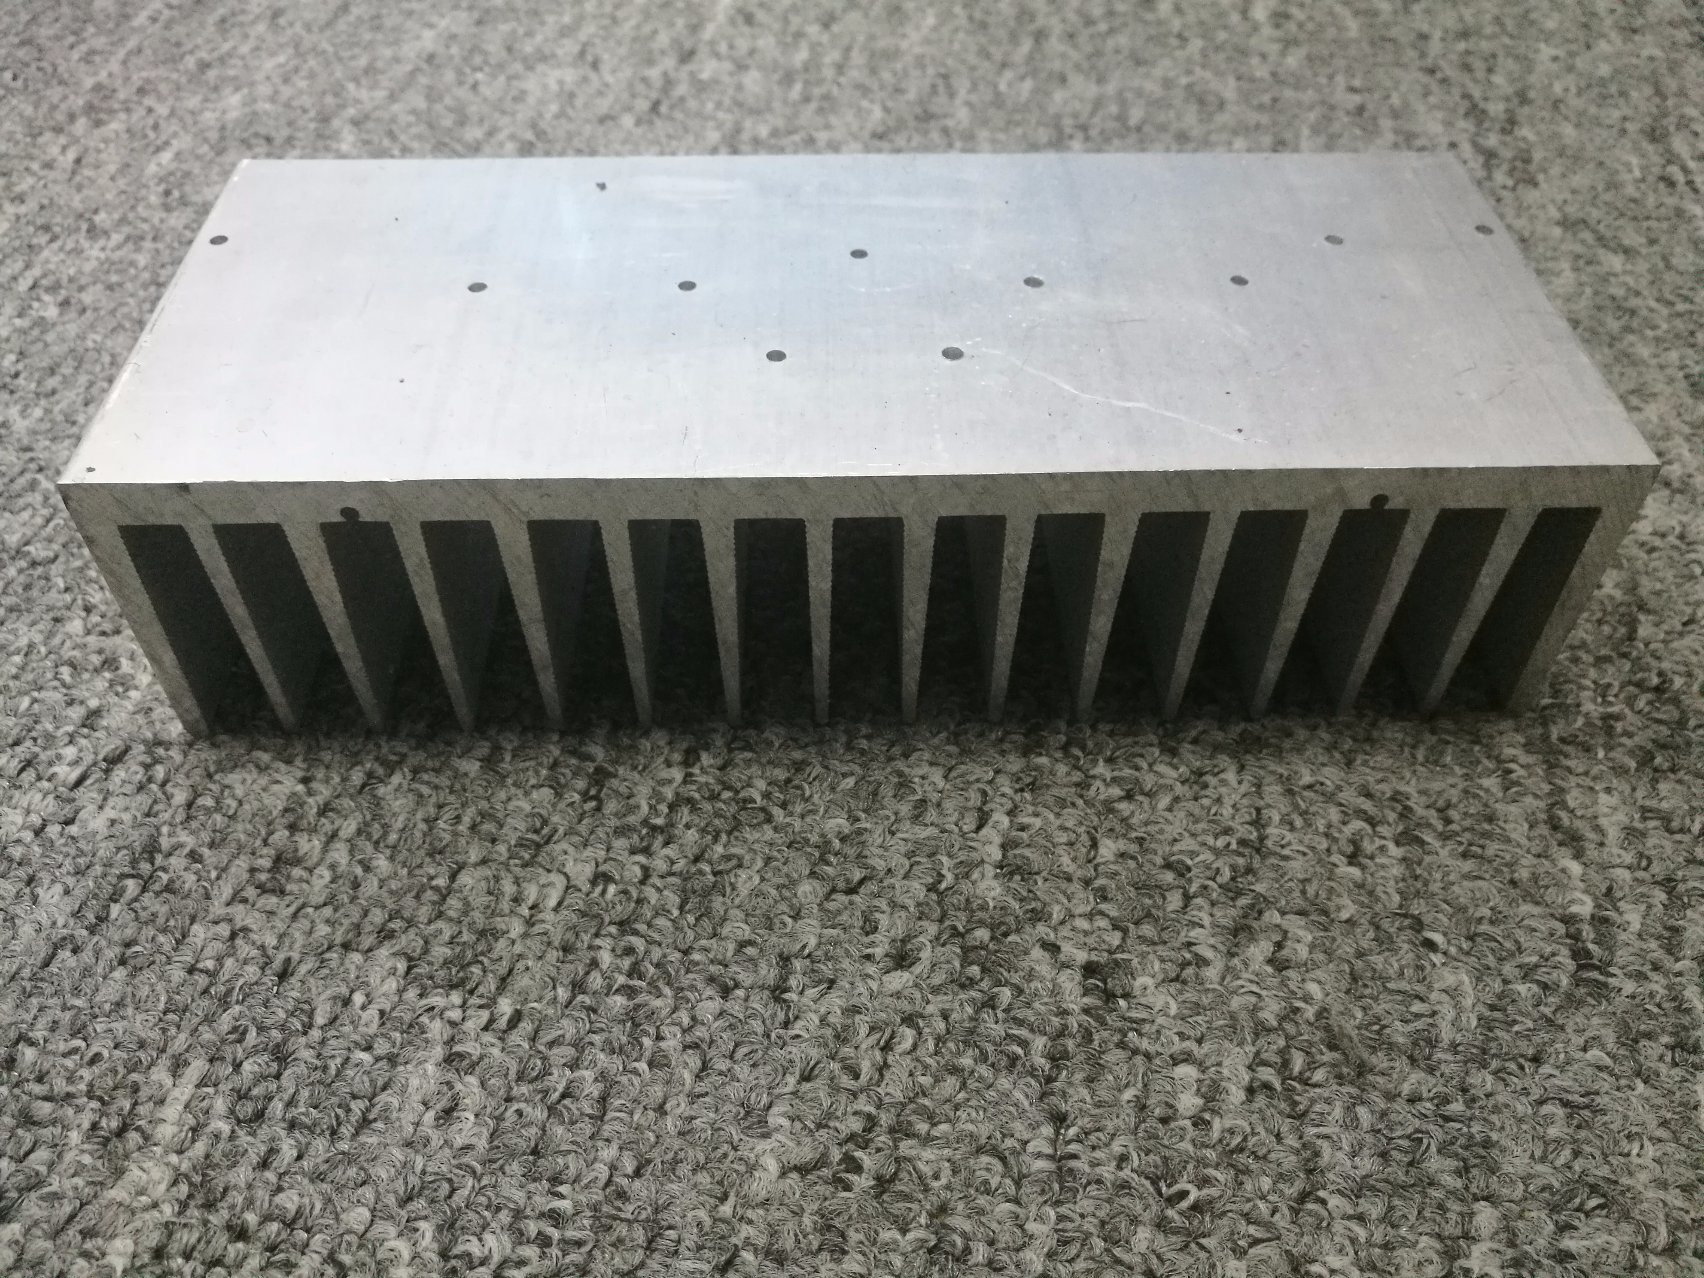 CNC Machined 6063t5 Mill Finish Aluminum Extruded Heatsink Profile